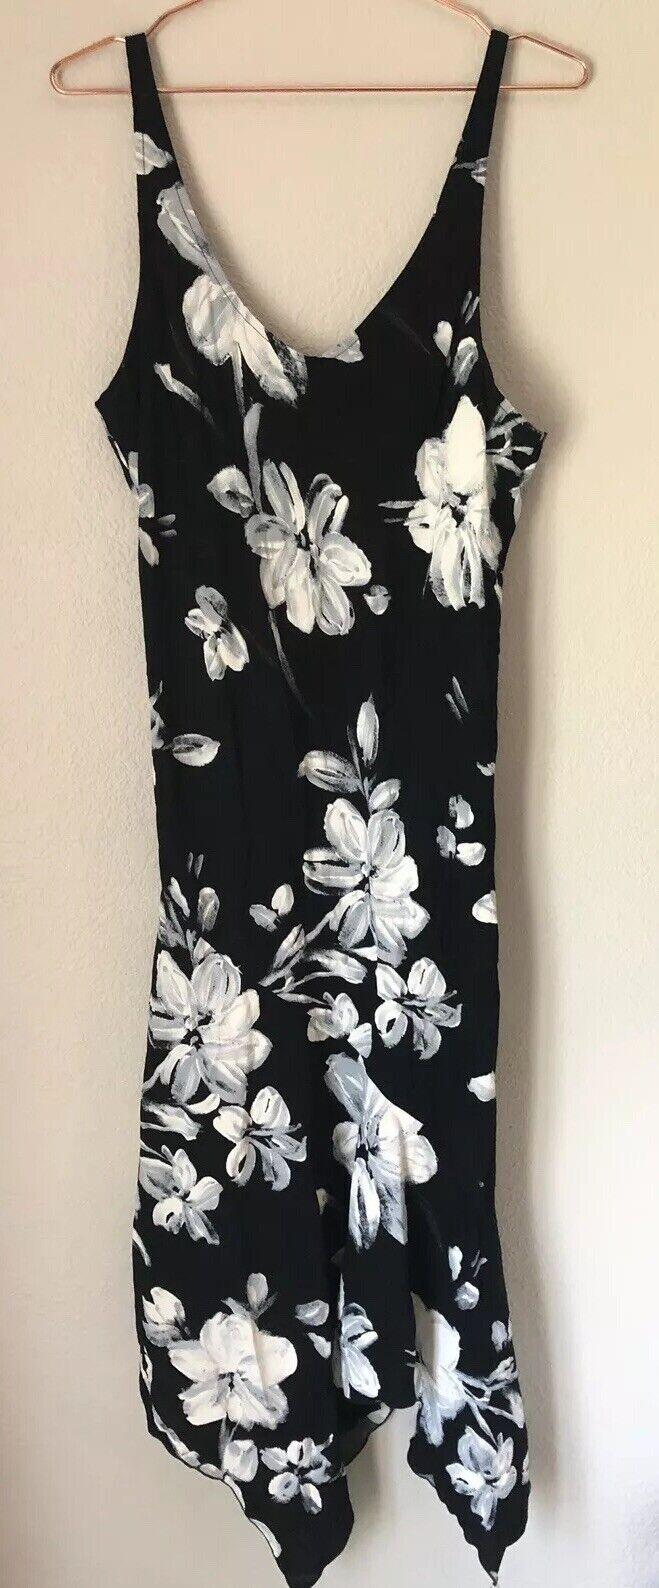 Jams värld kvinnor Julia Floral Print Midi Slieveless Dress Storlek L NWT